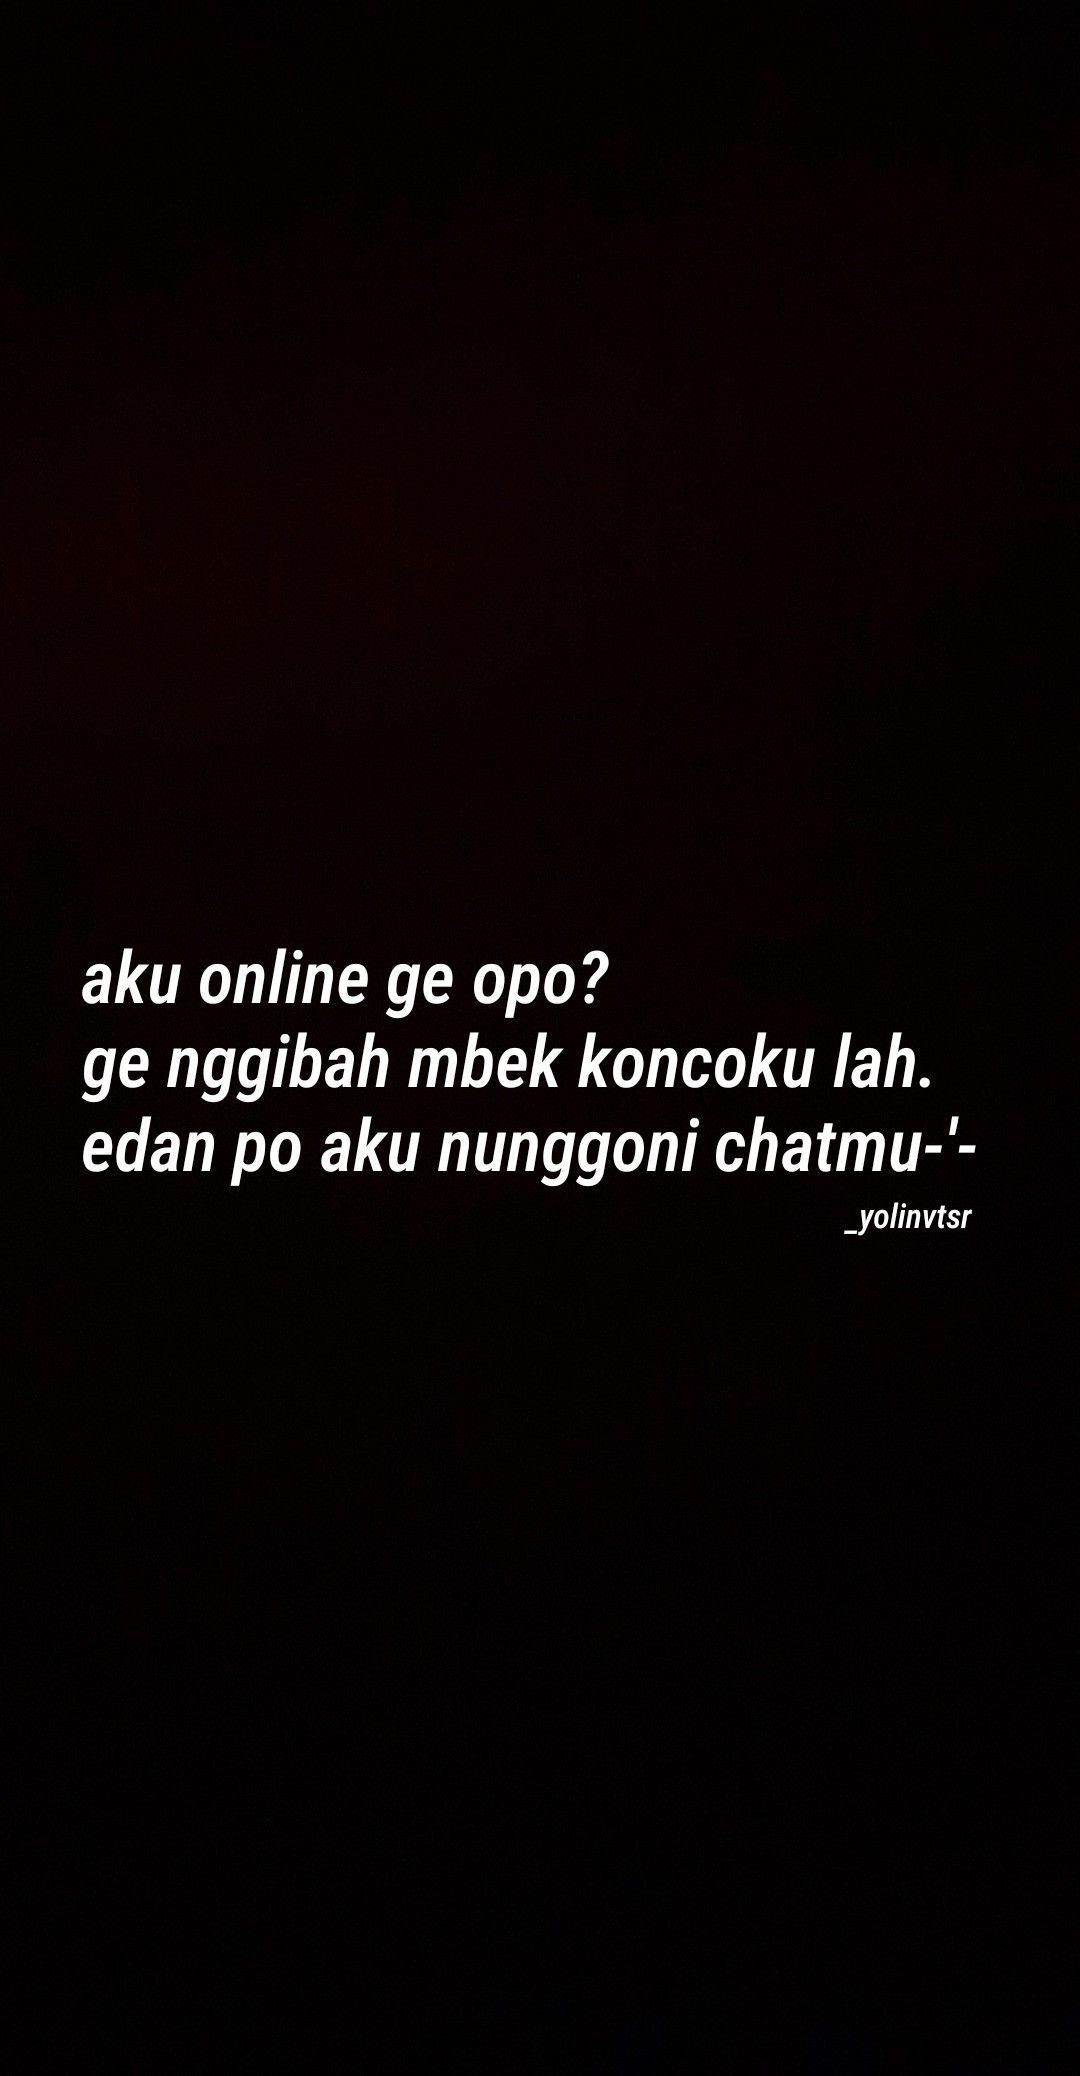 Pin Oleh Watermln Di Quotes Jowo Kutipan Humor Kata Kata